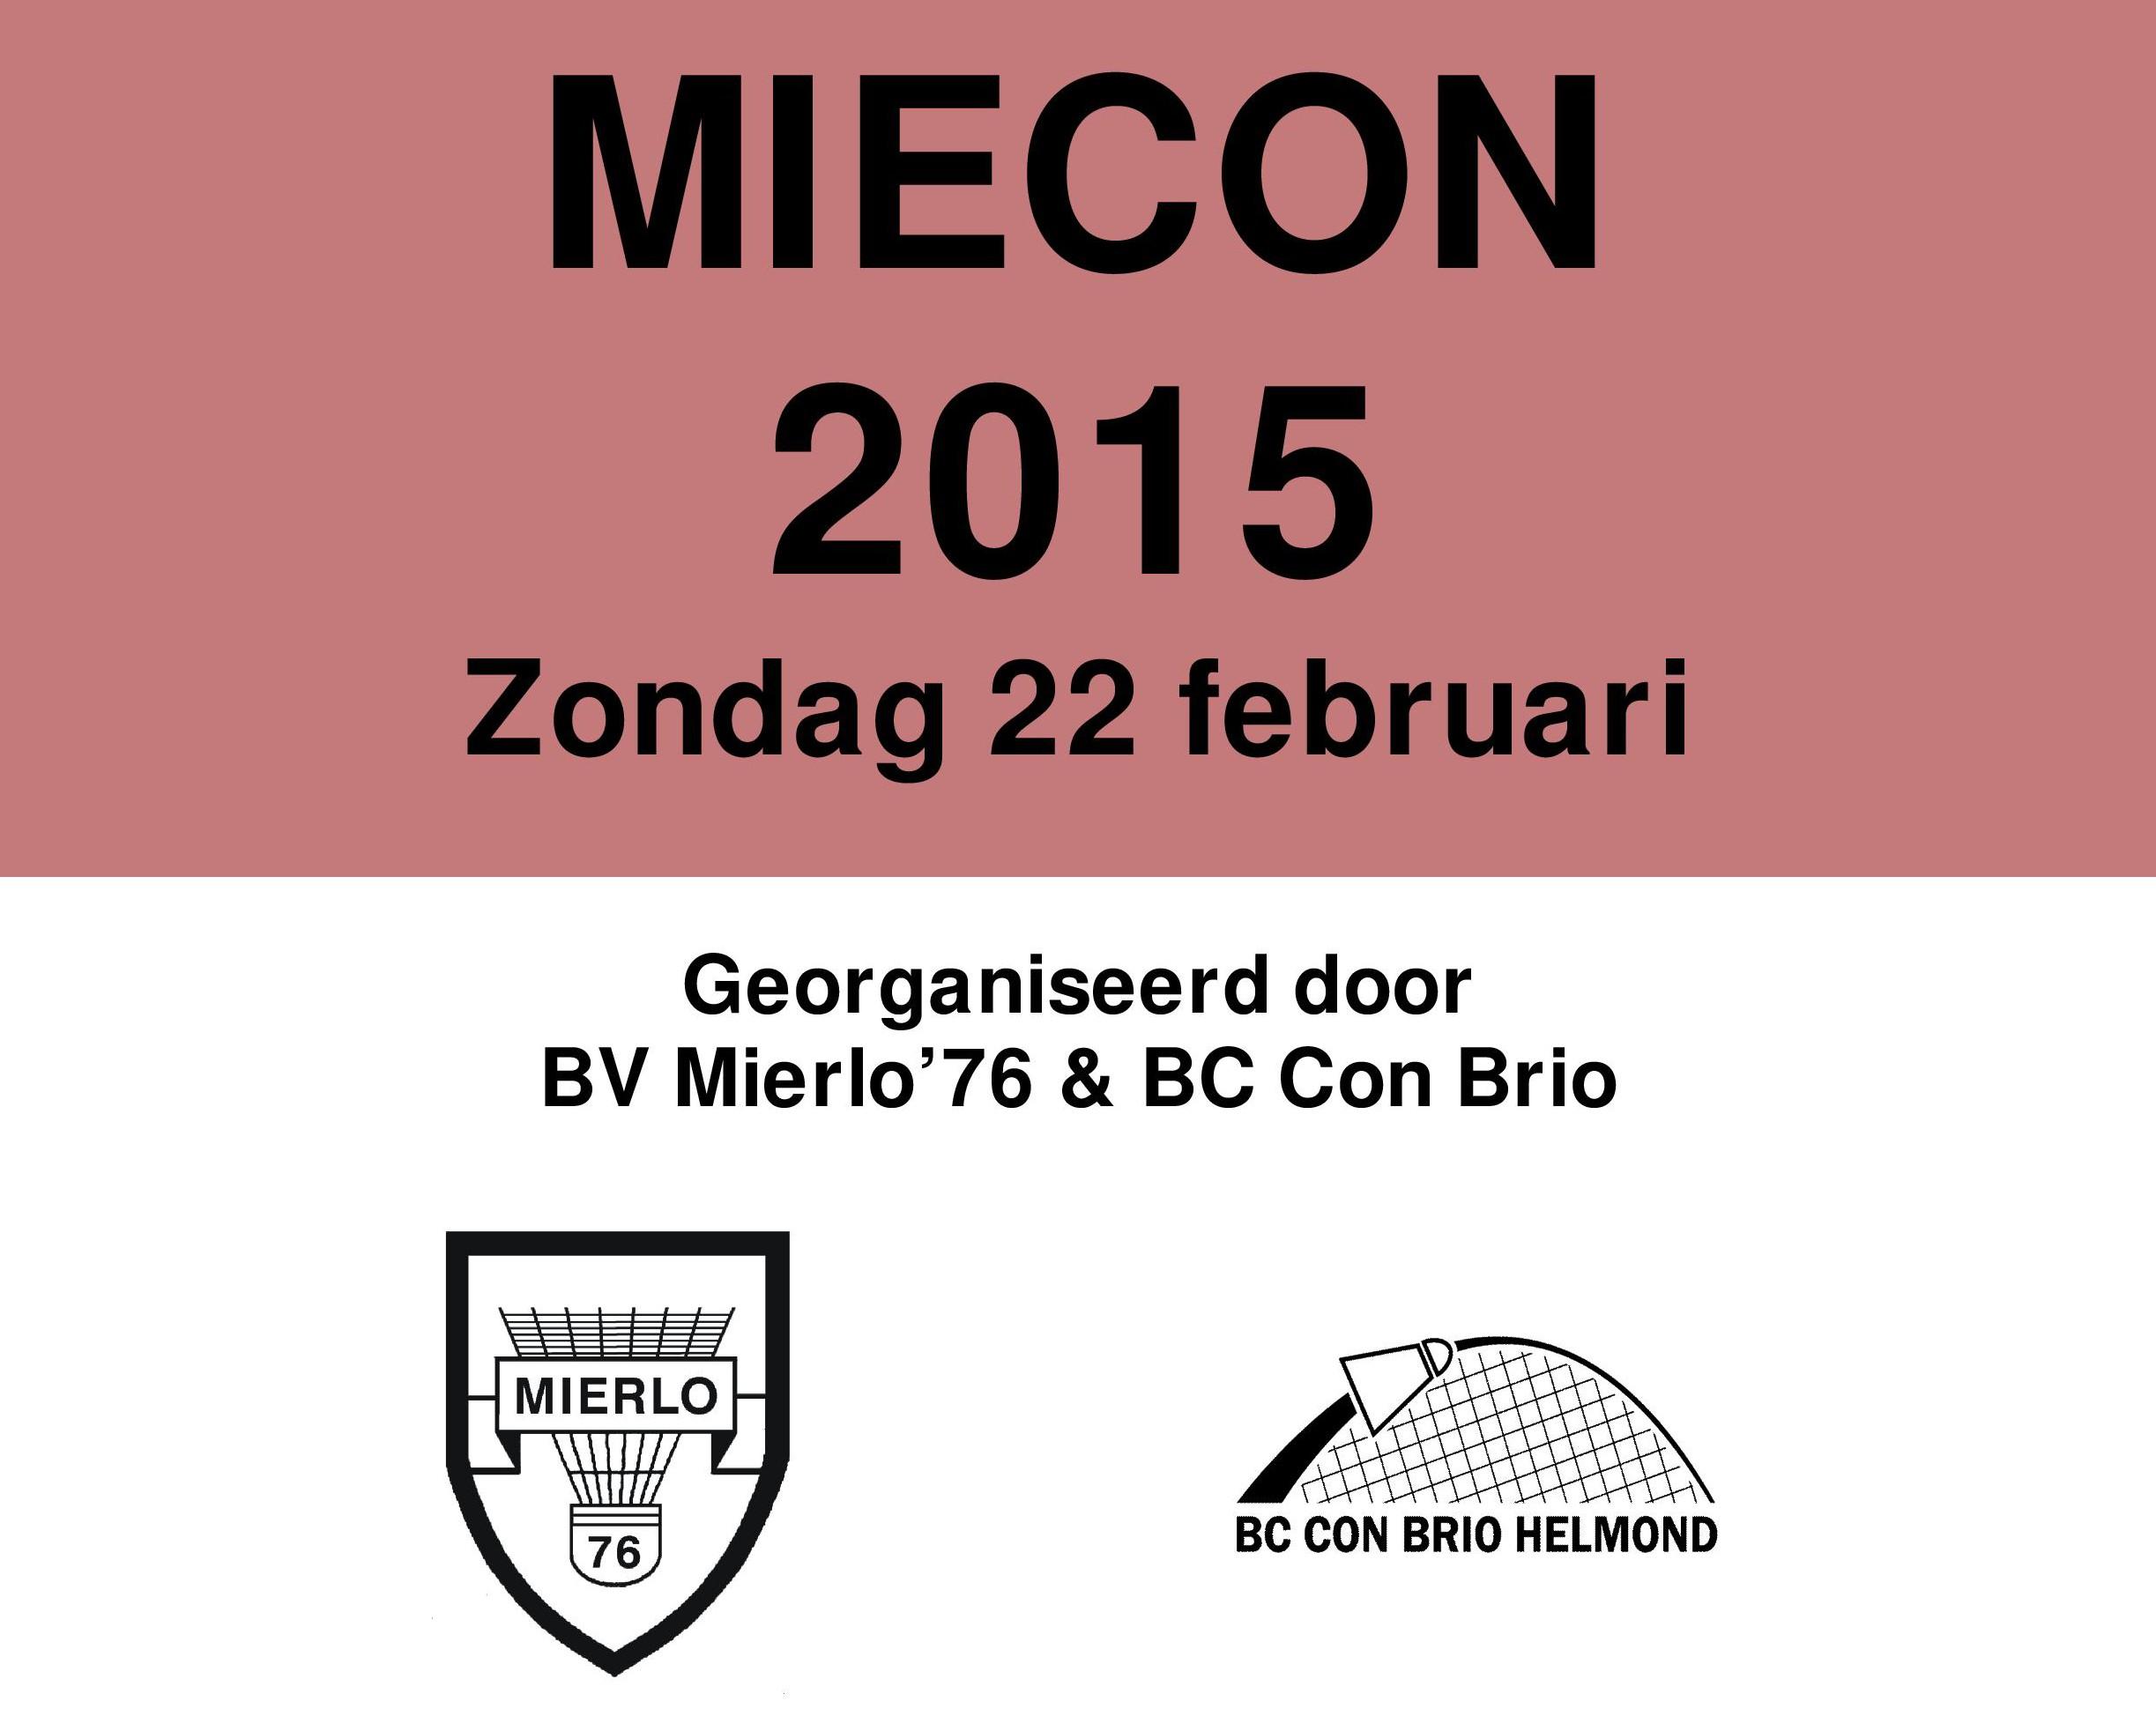 Uitnodiging MieCon Seniorentoernooi 2015